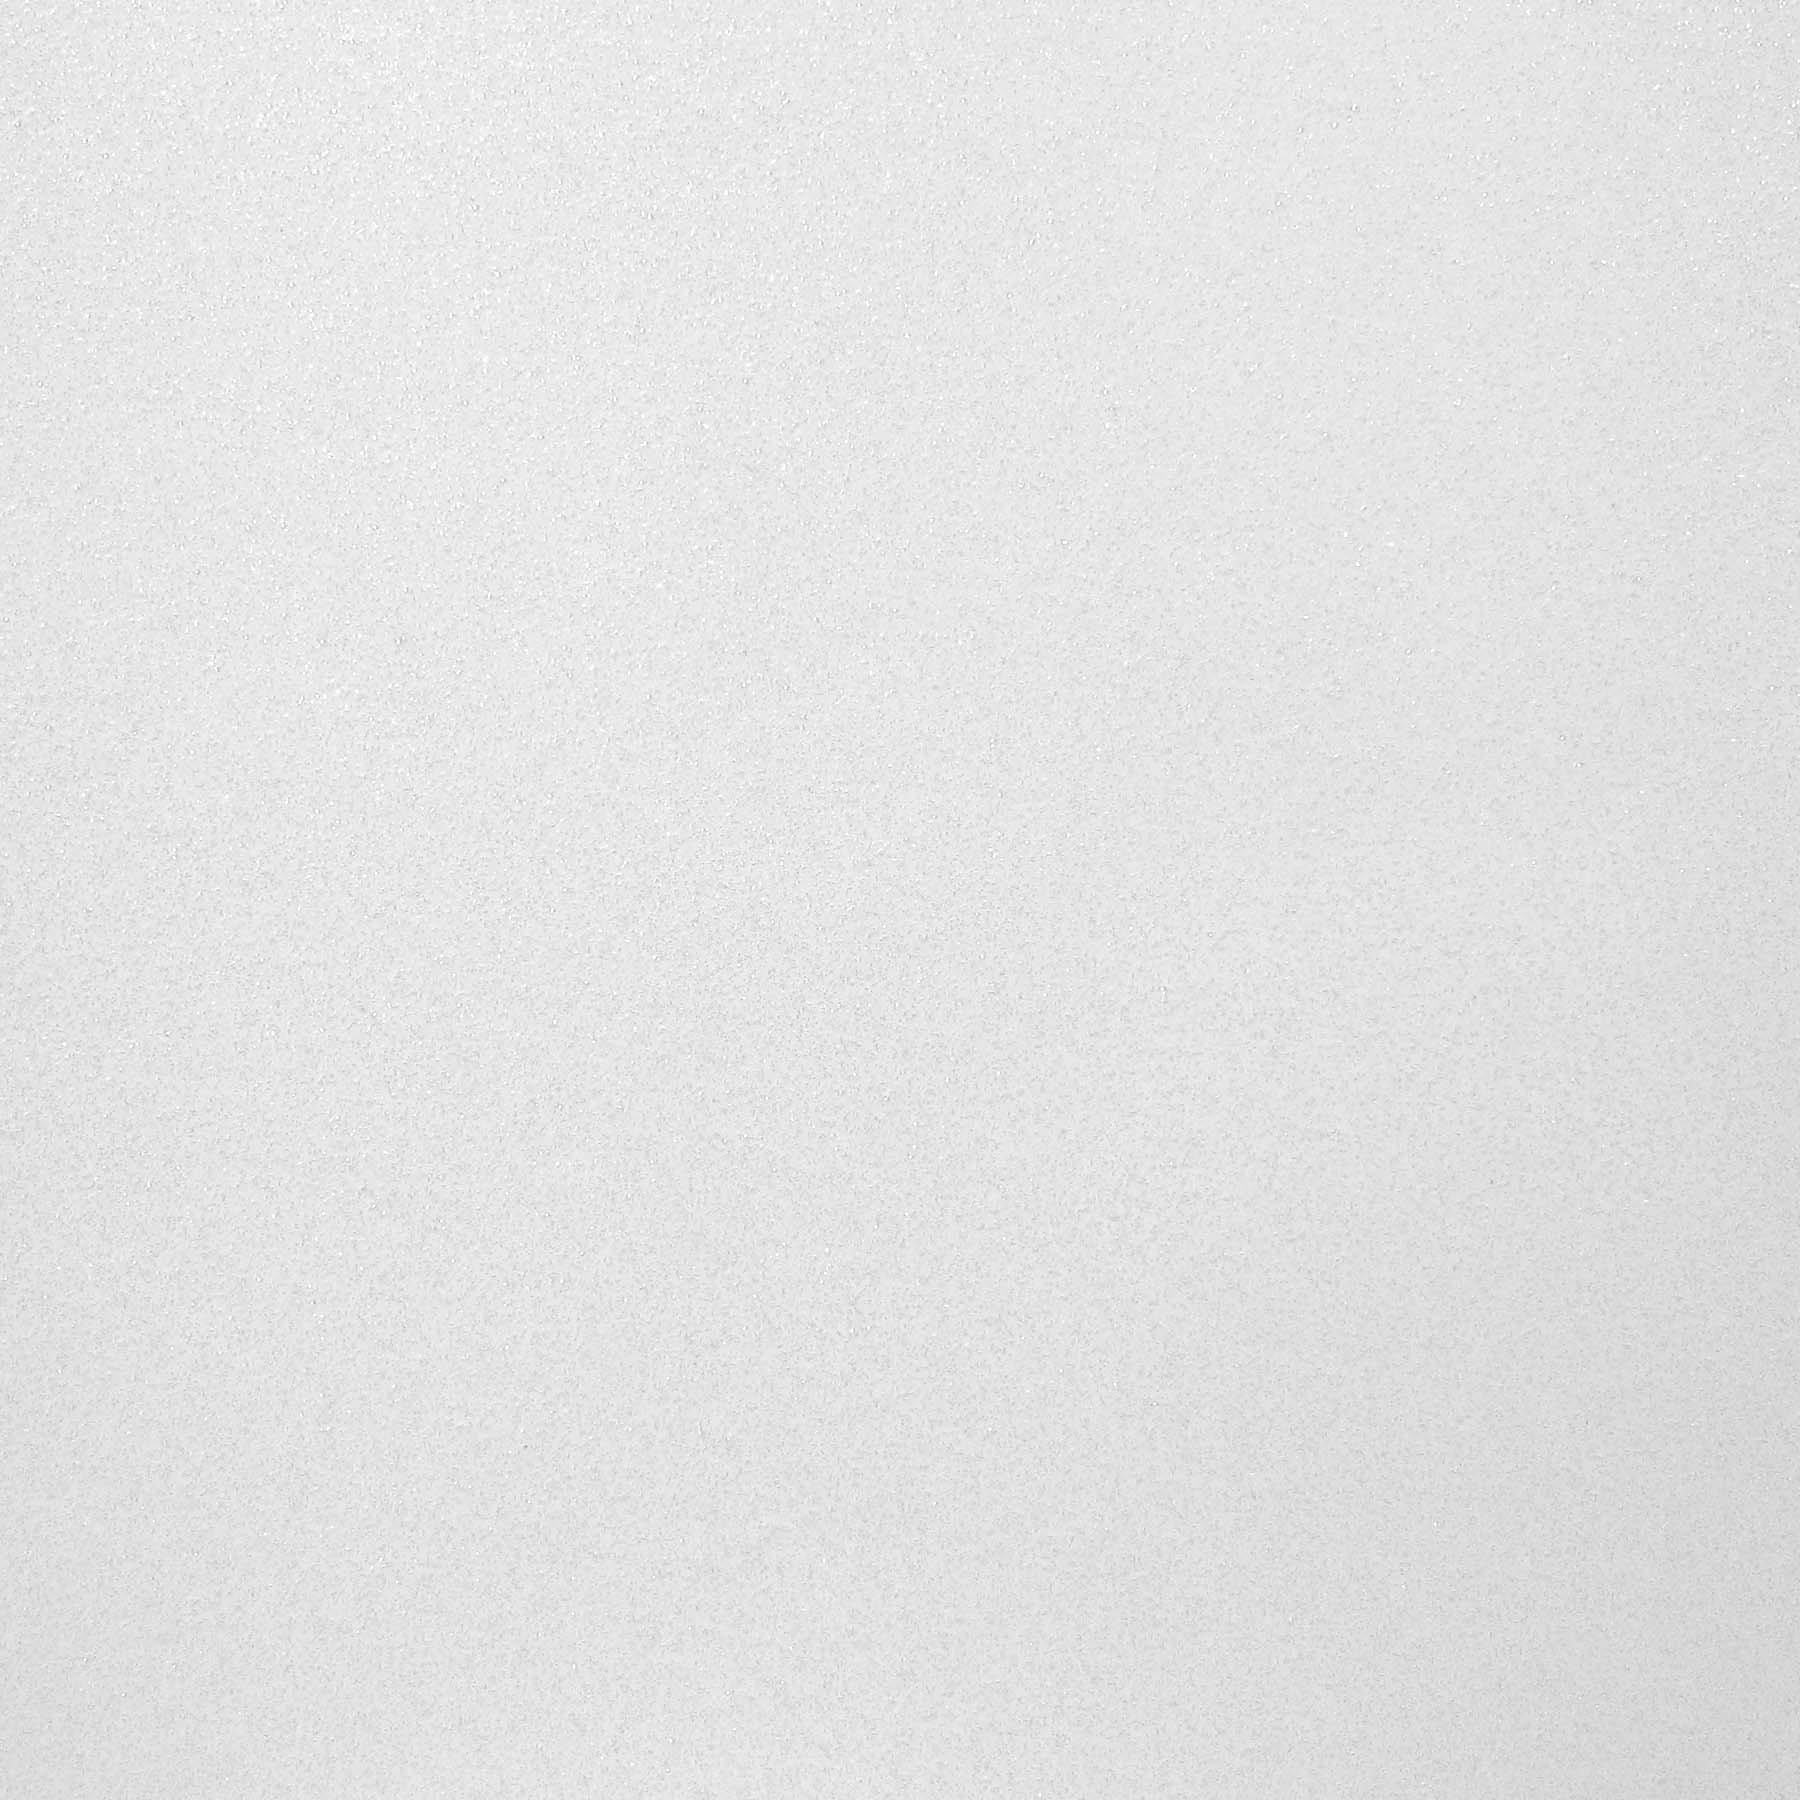 Best Creation Paper 12x12 Glitter White (Pack of 15)